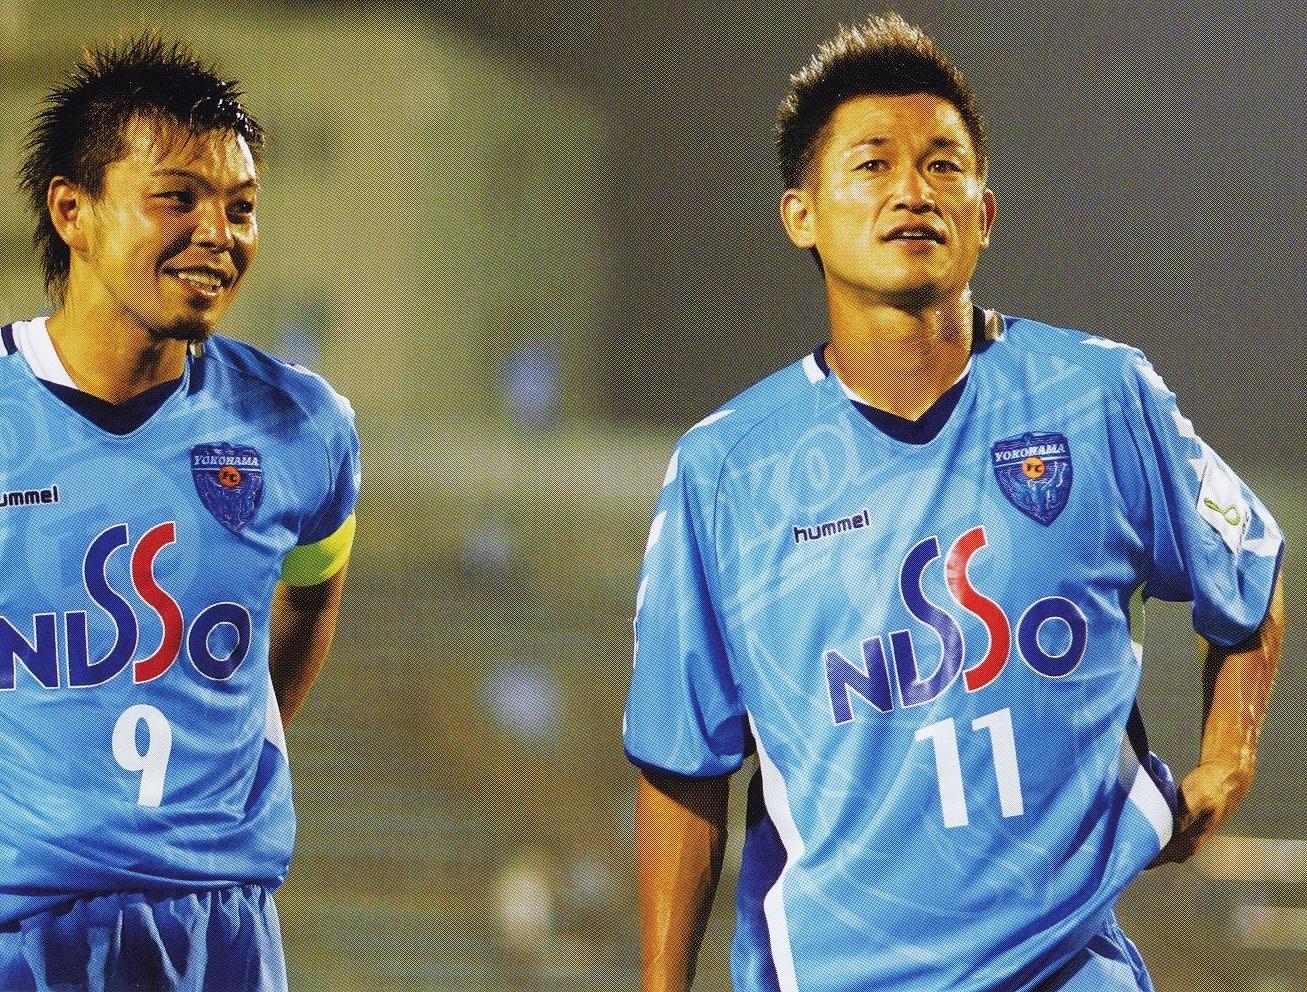 横浜FC-2005-hummel-ホーム-三浦知良-城彰二.jpg